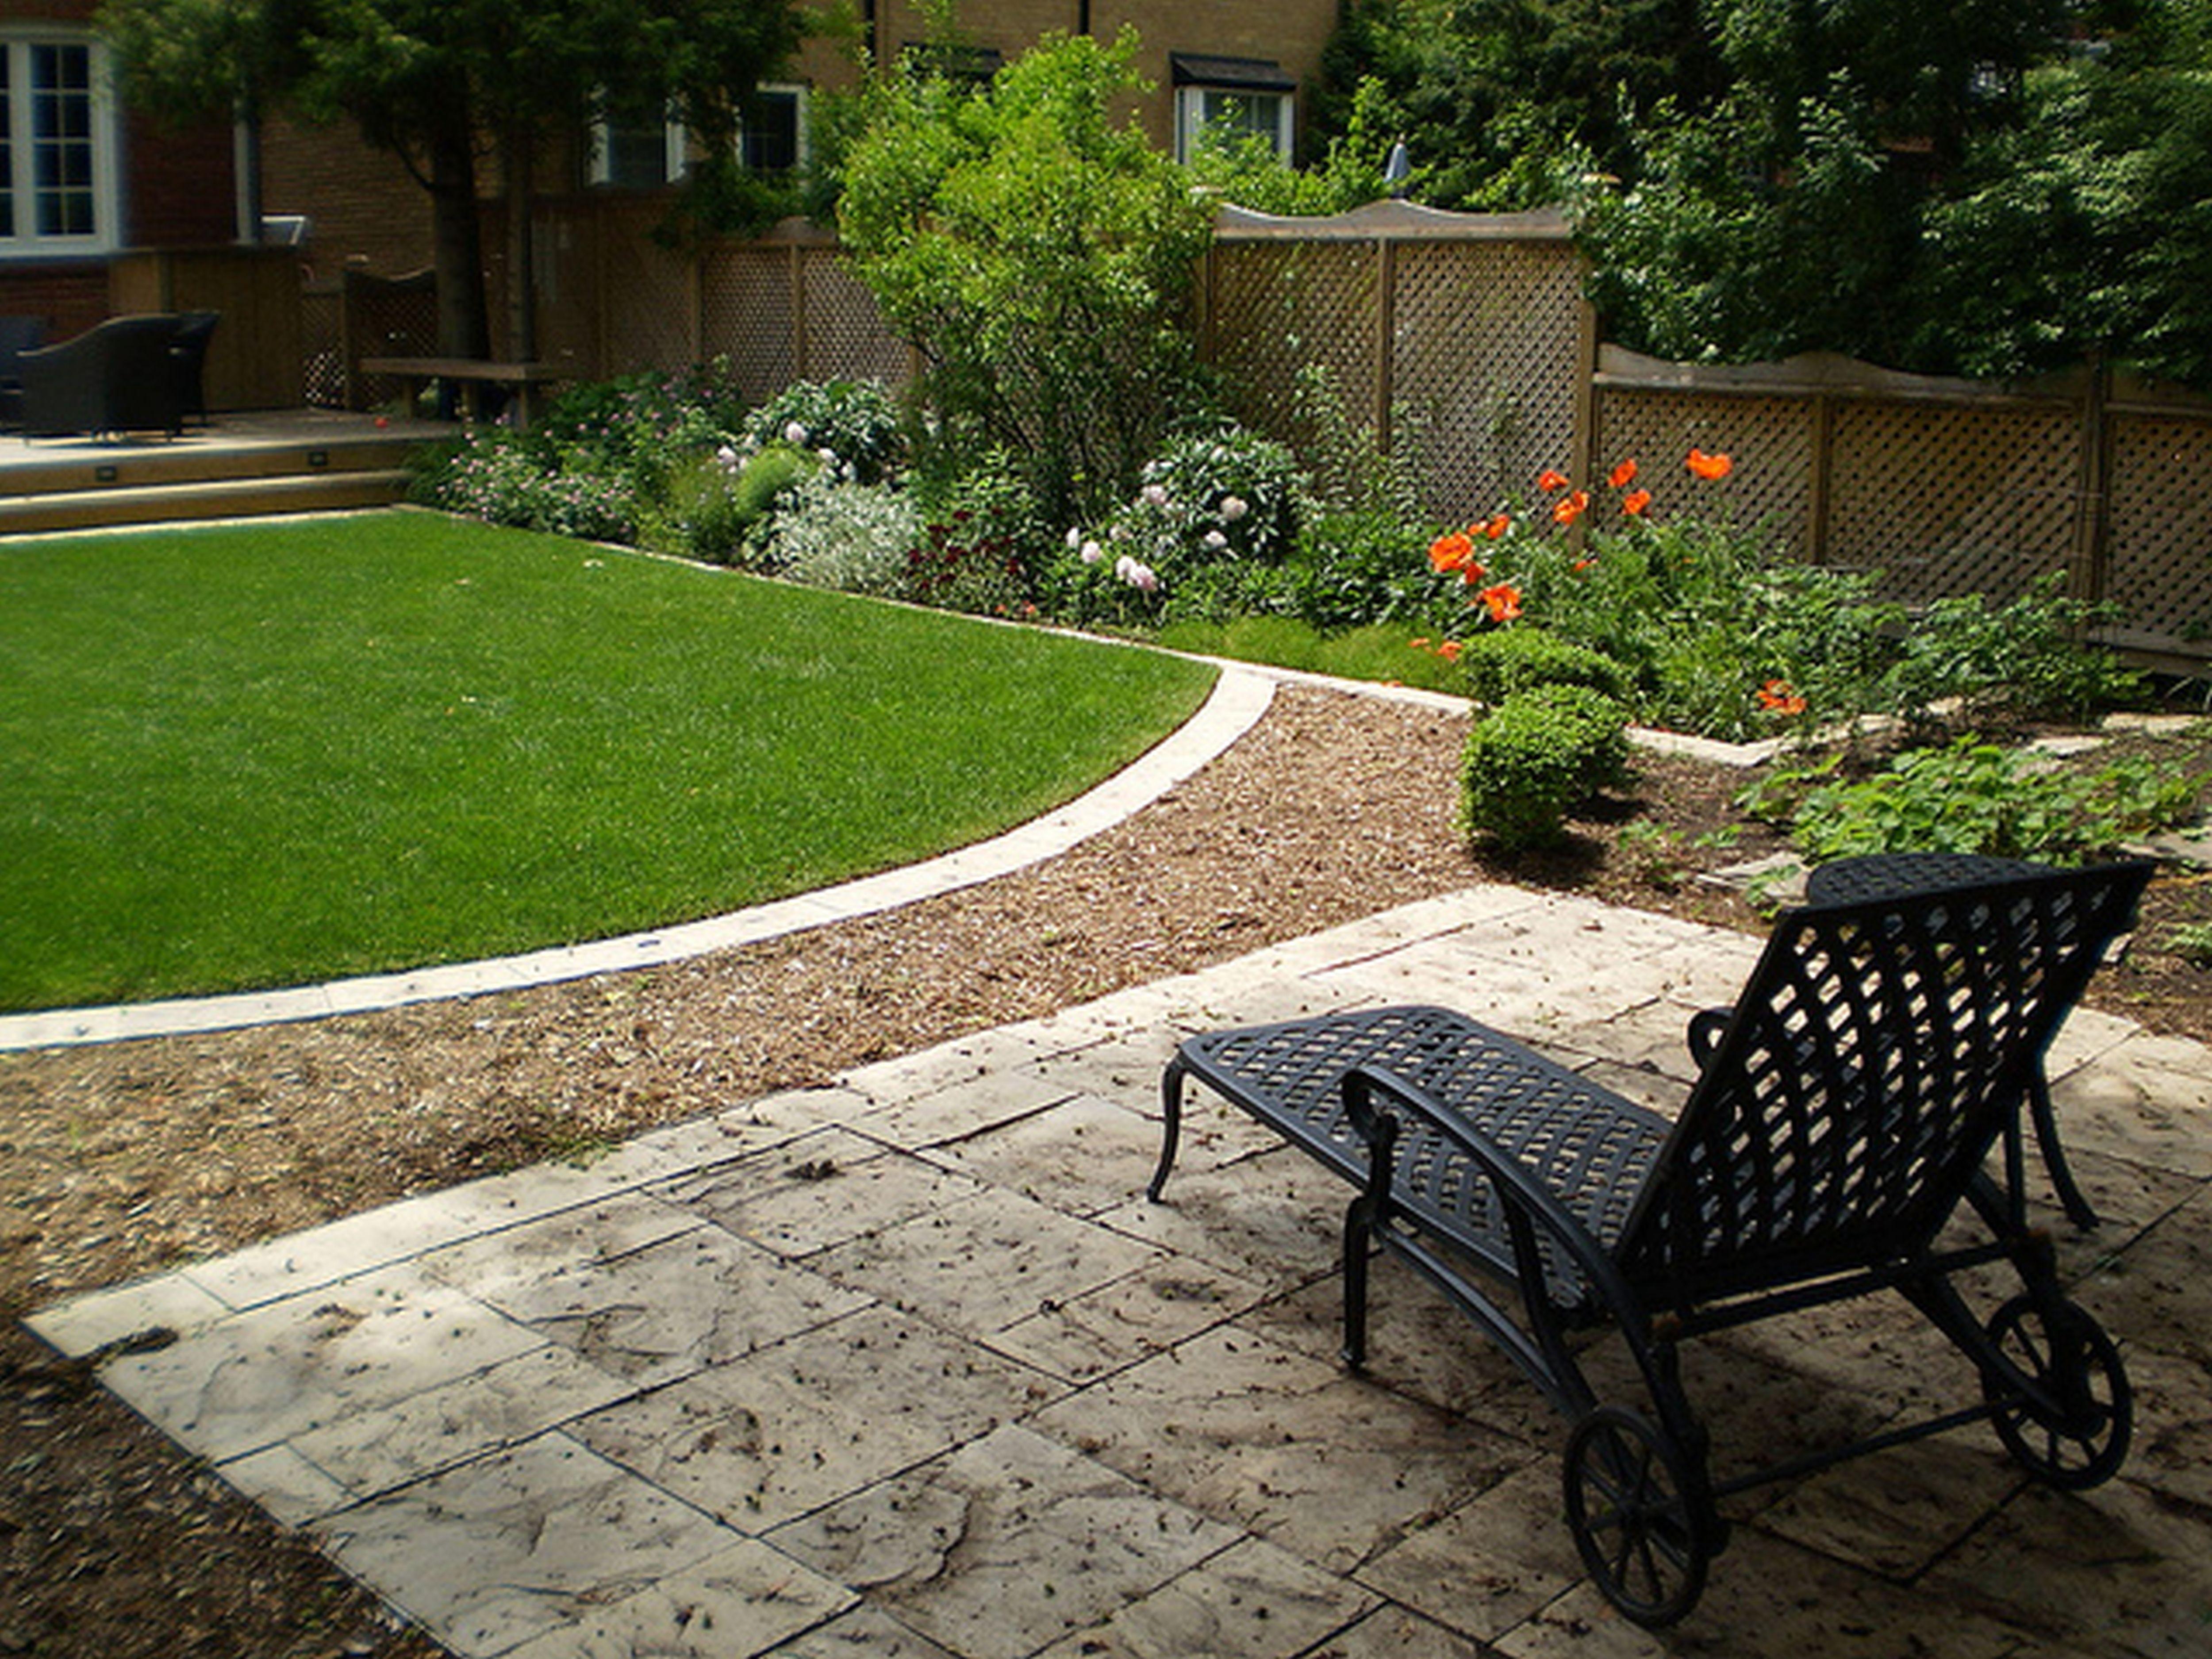 Garden Design Ideas For Small Backyards Hawk Haven